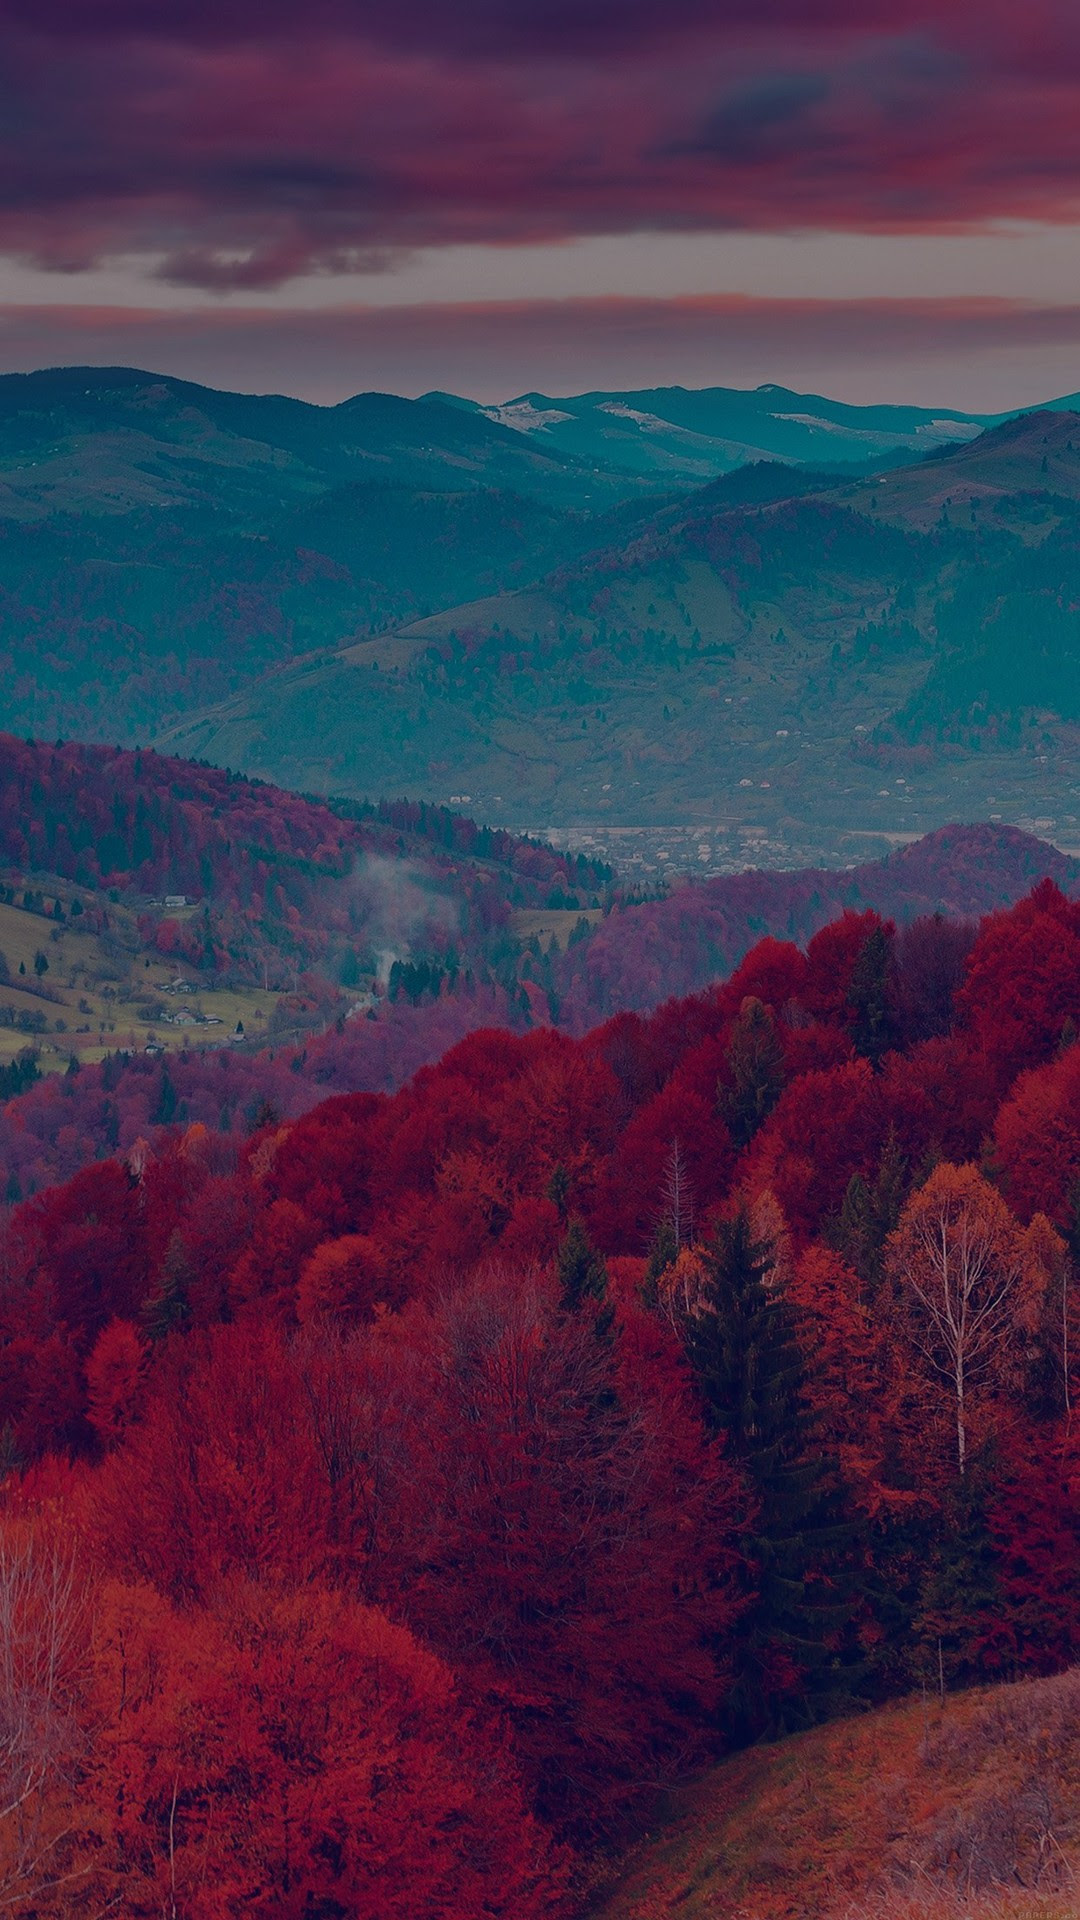 Fall Wallpaper and Screensavers (54+ images)